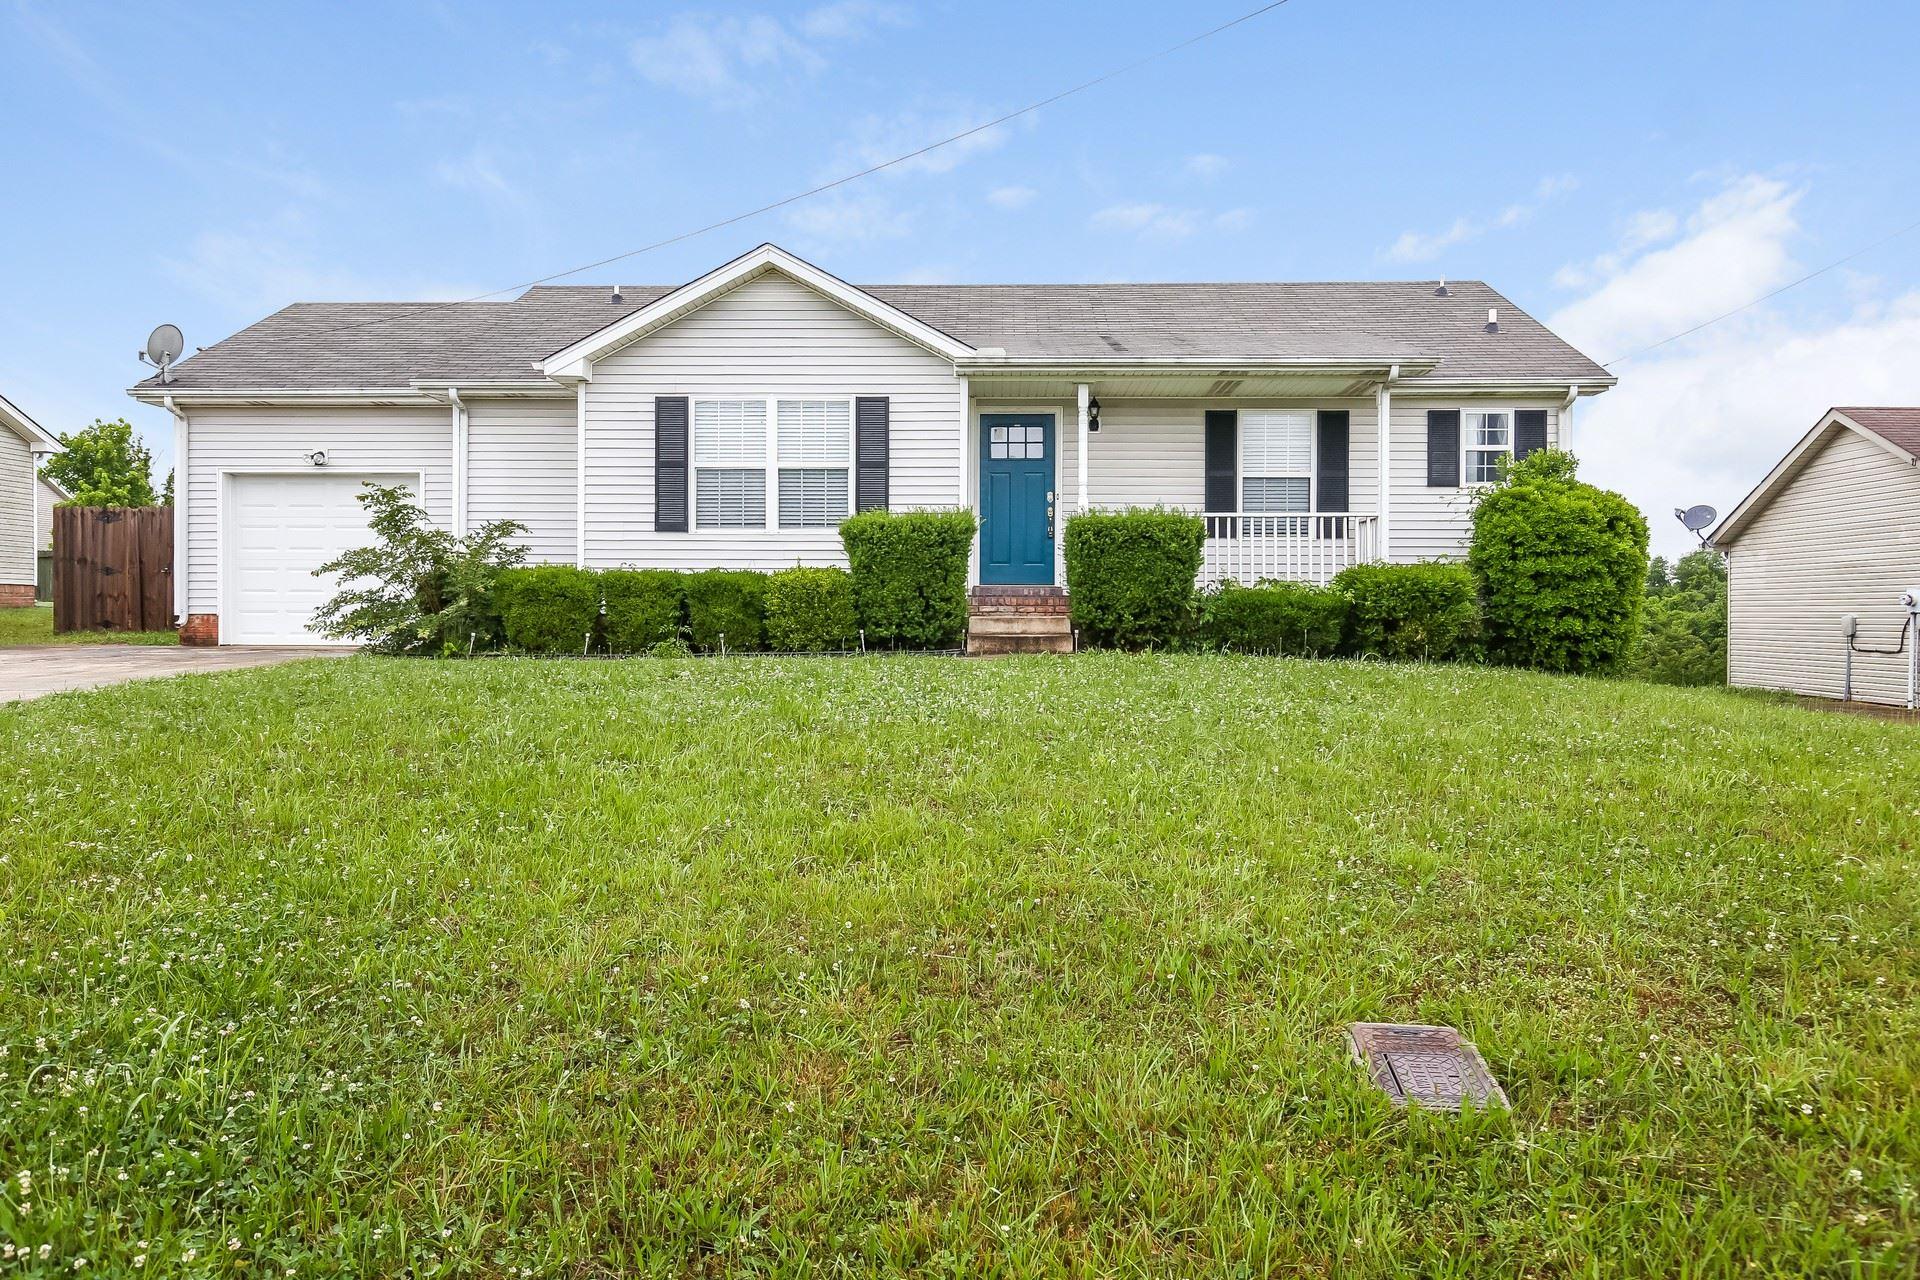 1324 Burchett Dr, Clarksville, TN 37042 - MLS#: 2261027